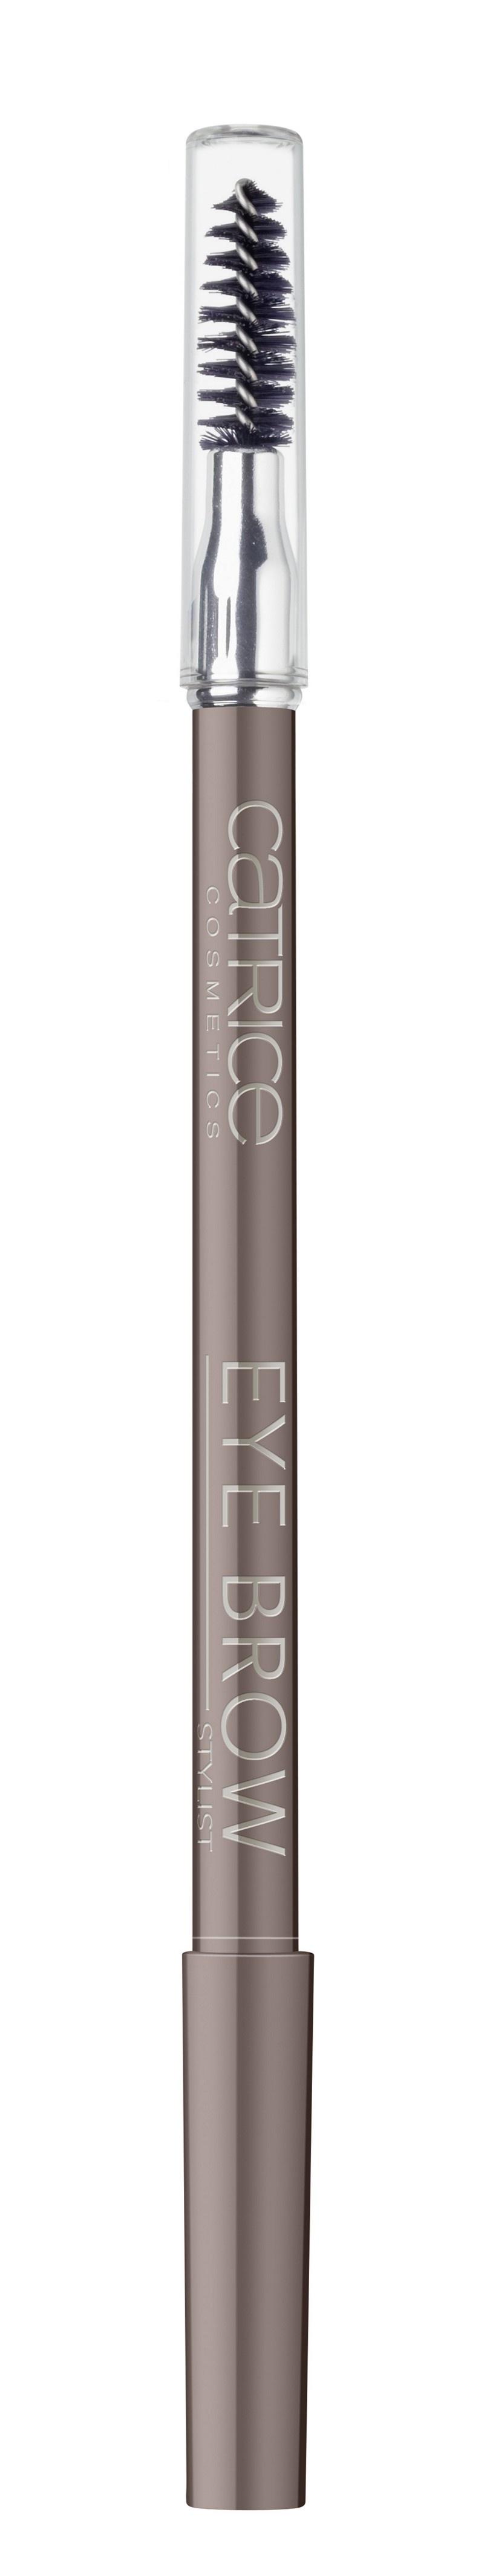 CATRICE Контур для бровей со щеткой Eye Brow Stylist 030 Brow-n-eyed Peas коричневый, 1,6гр satin brow